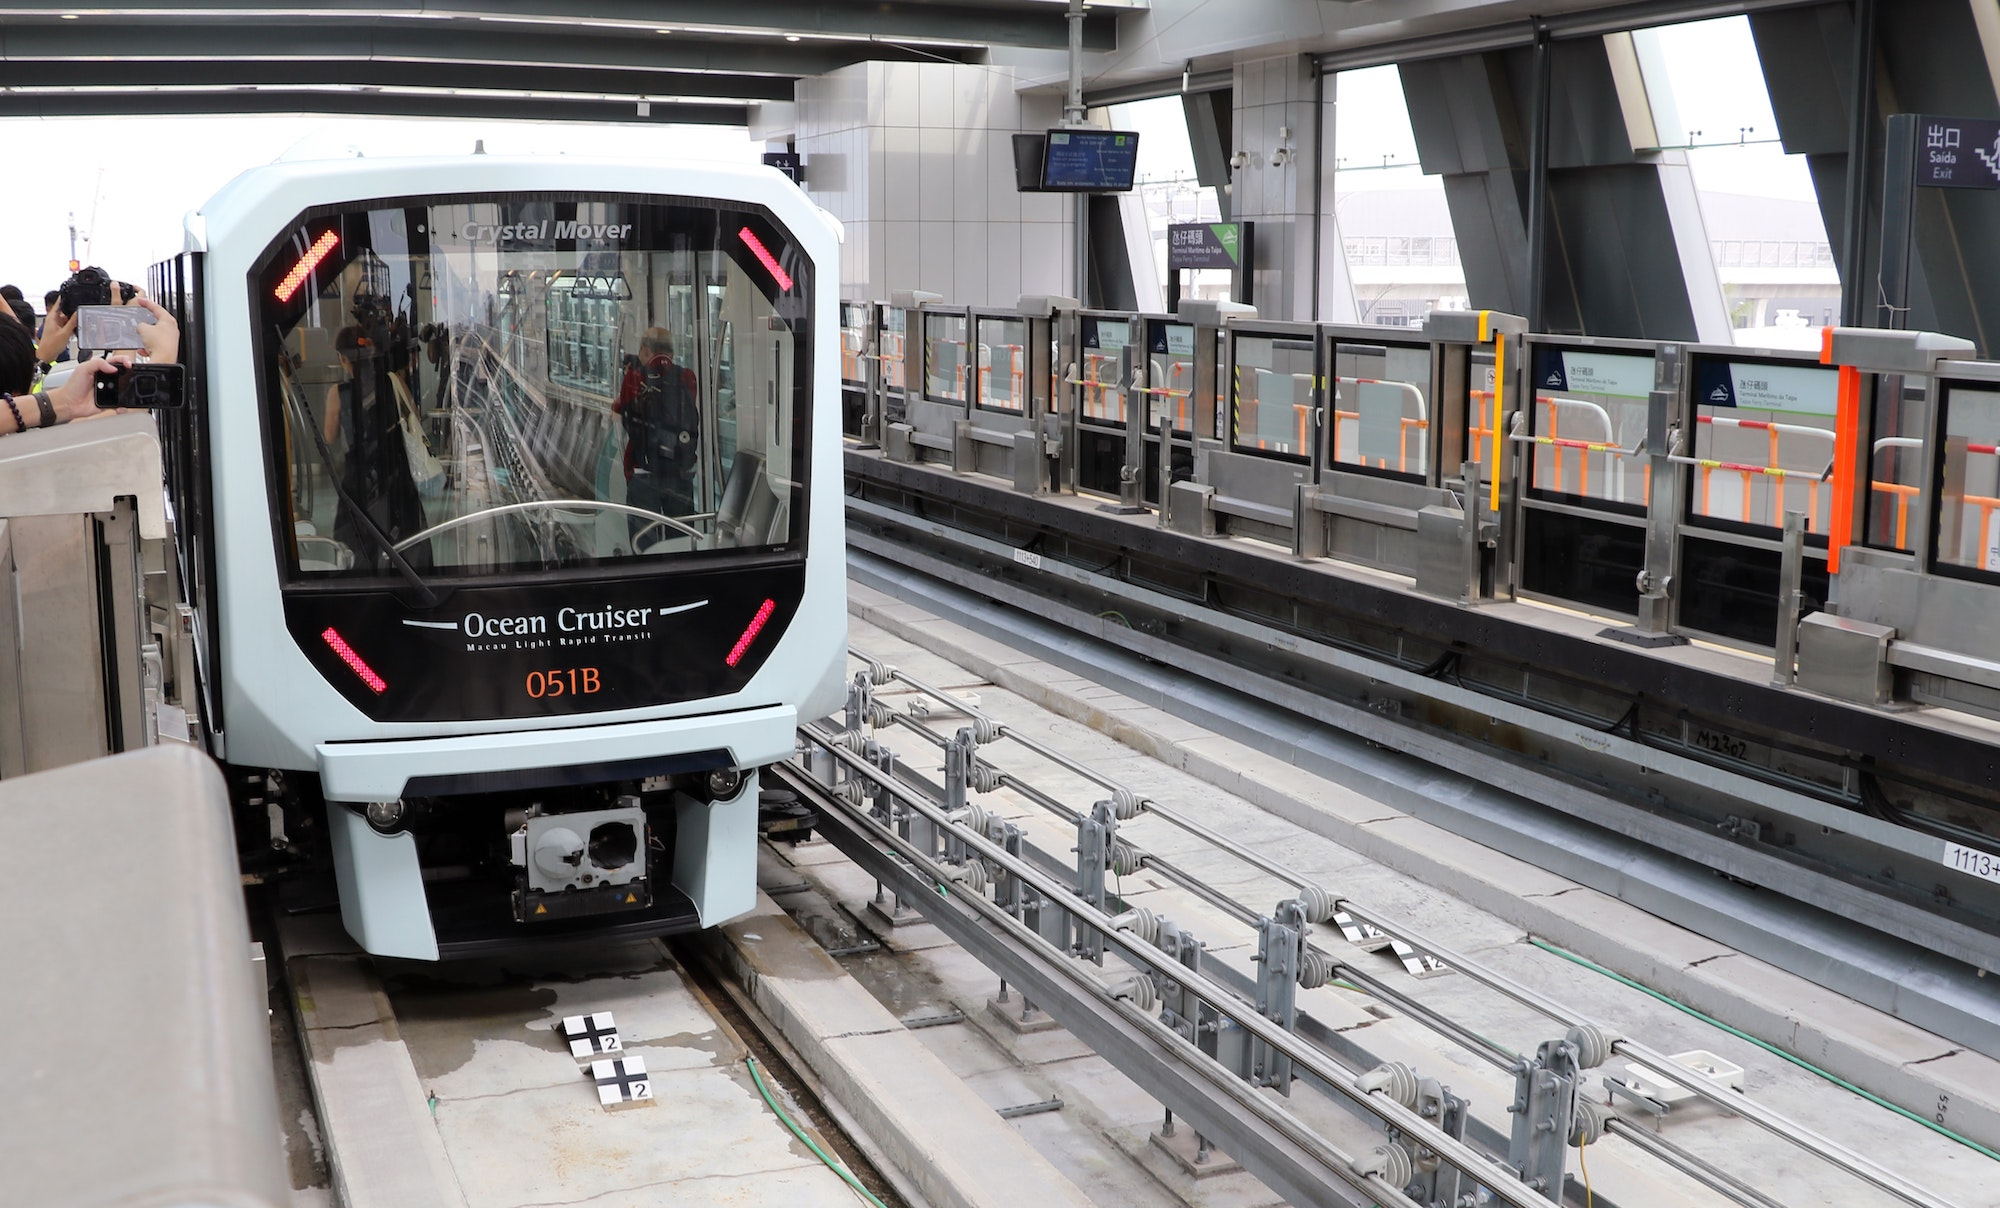 Light Rapid Transit